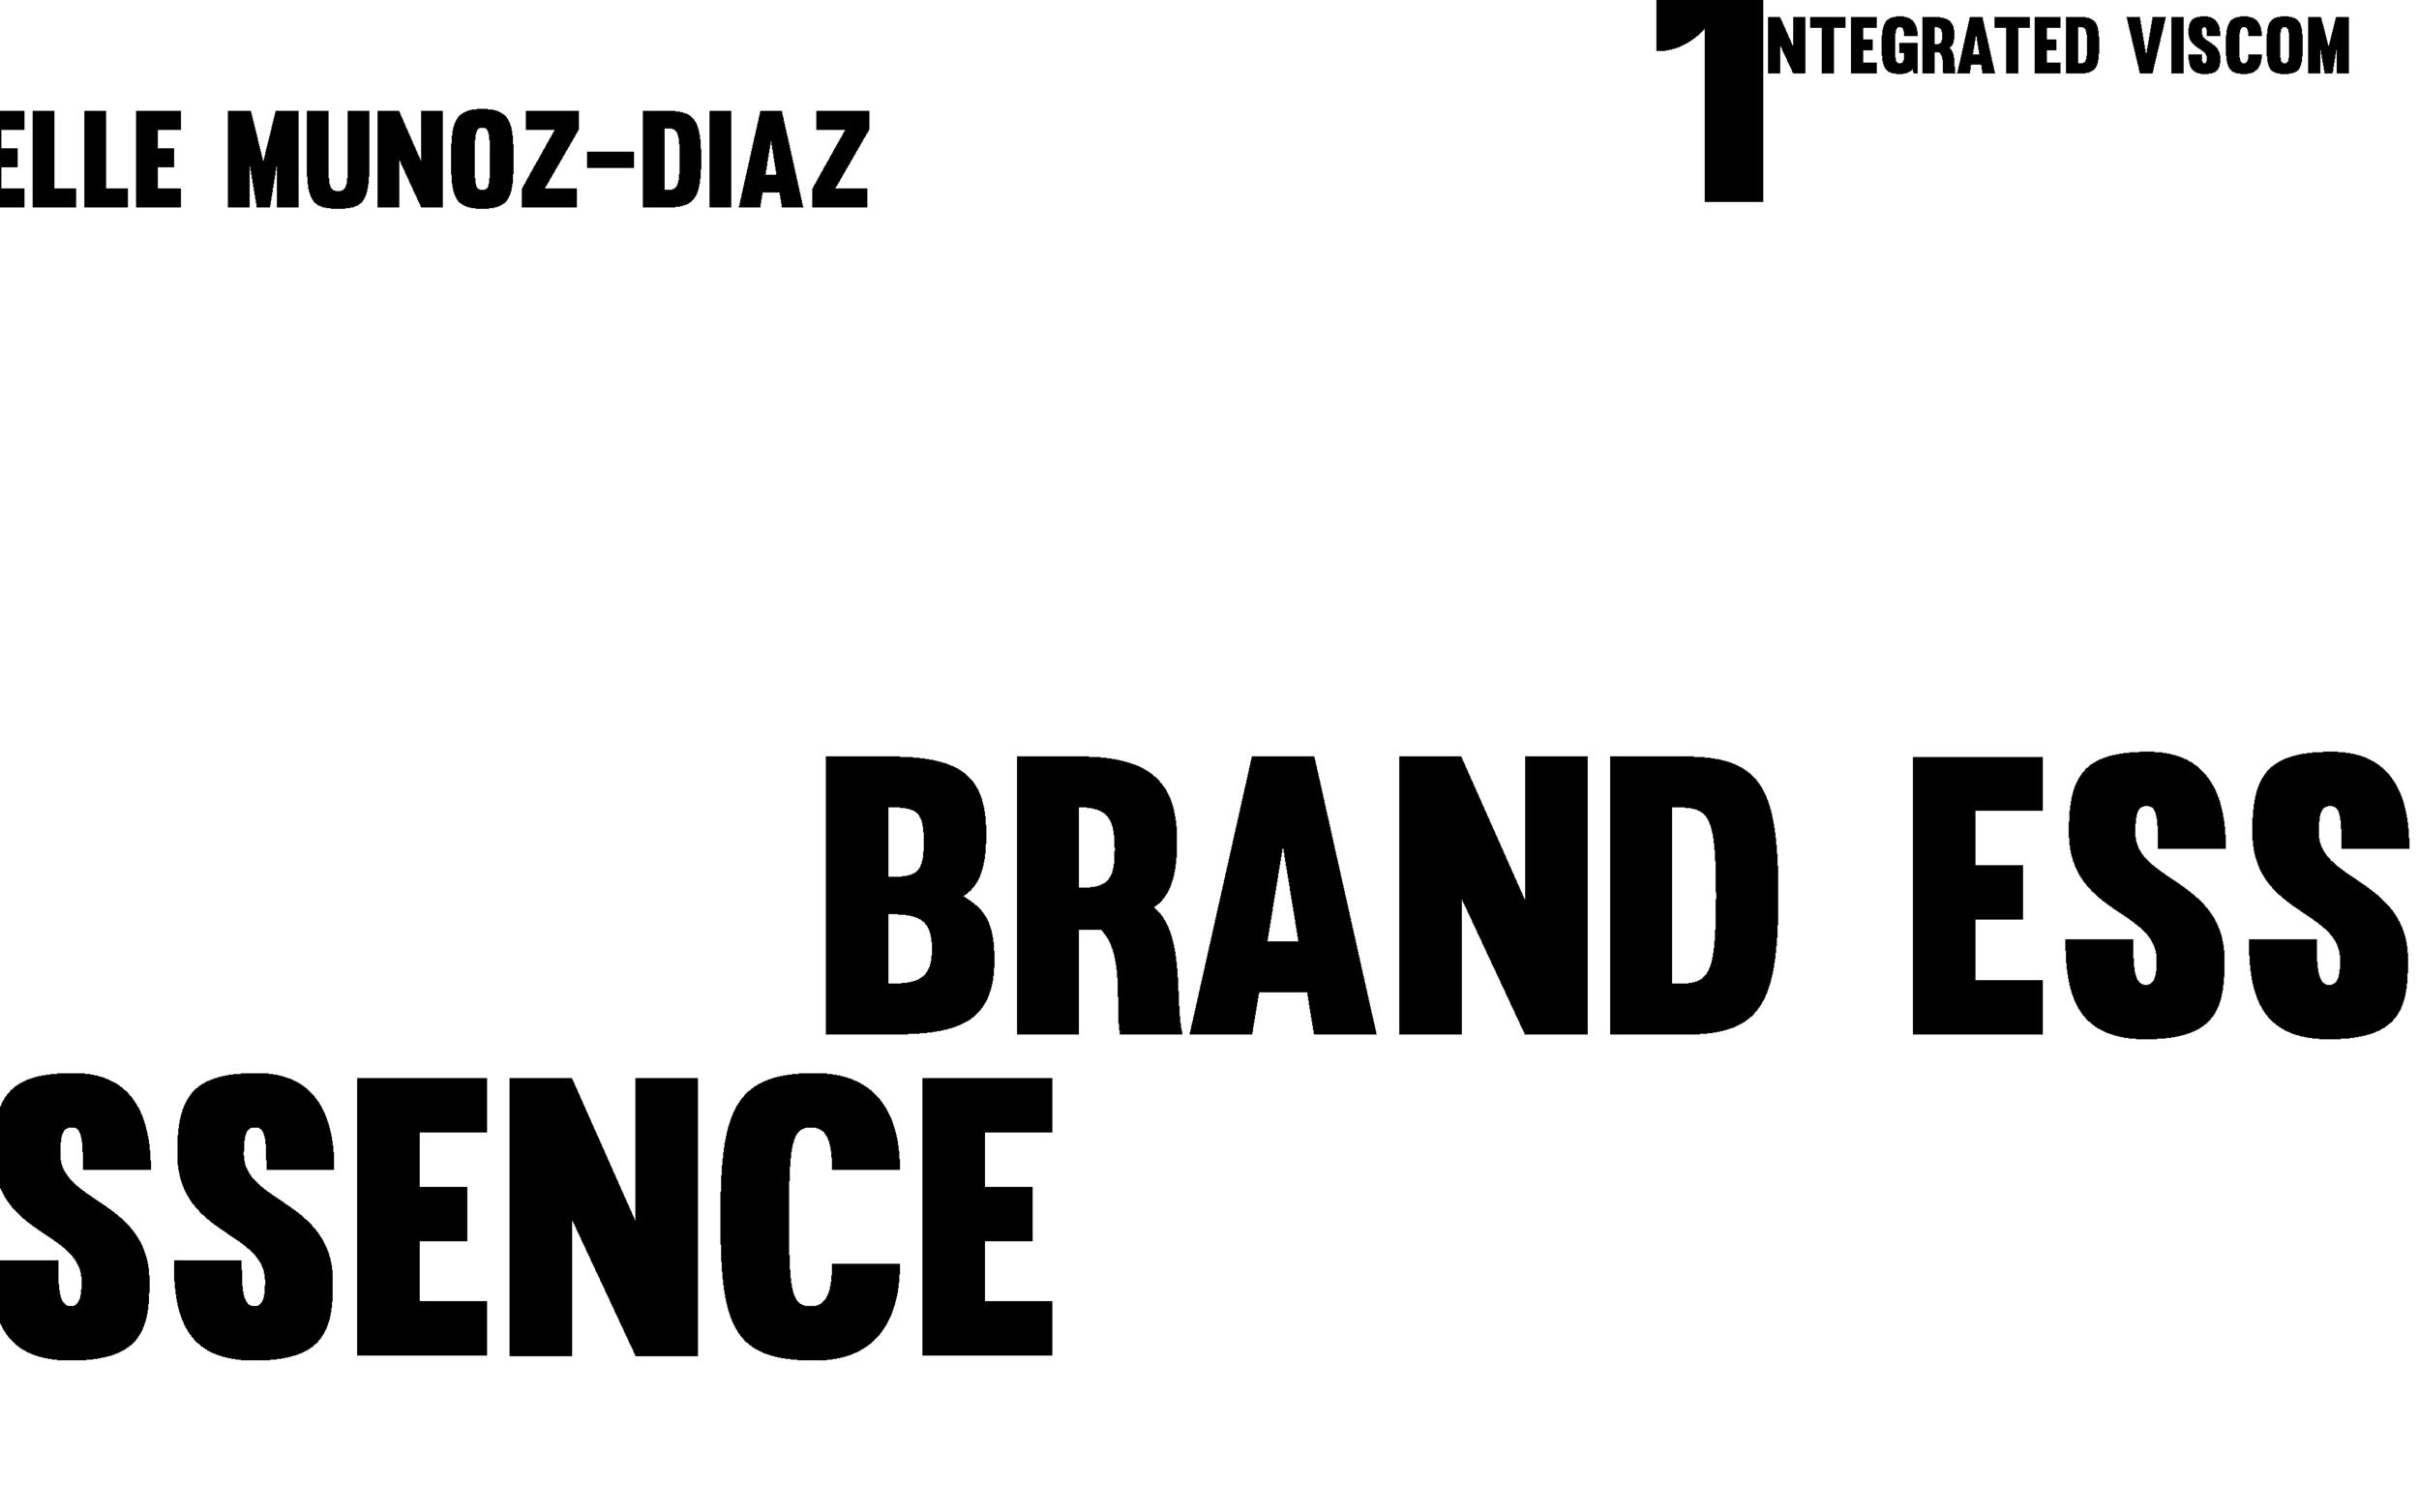 MunozDiaz_BrandEssence_IntegratedVisCom1_Page_1.png